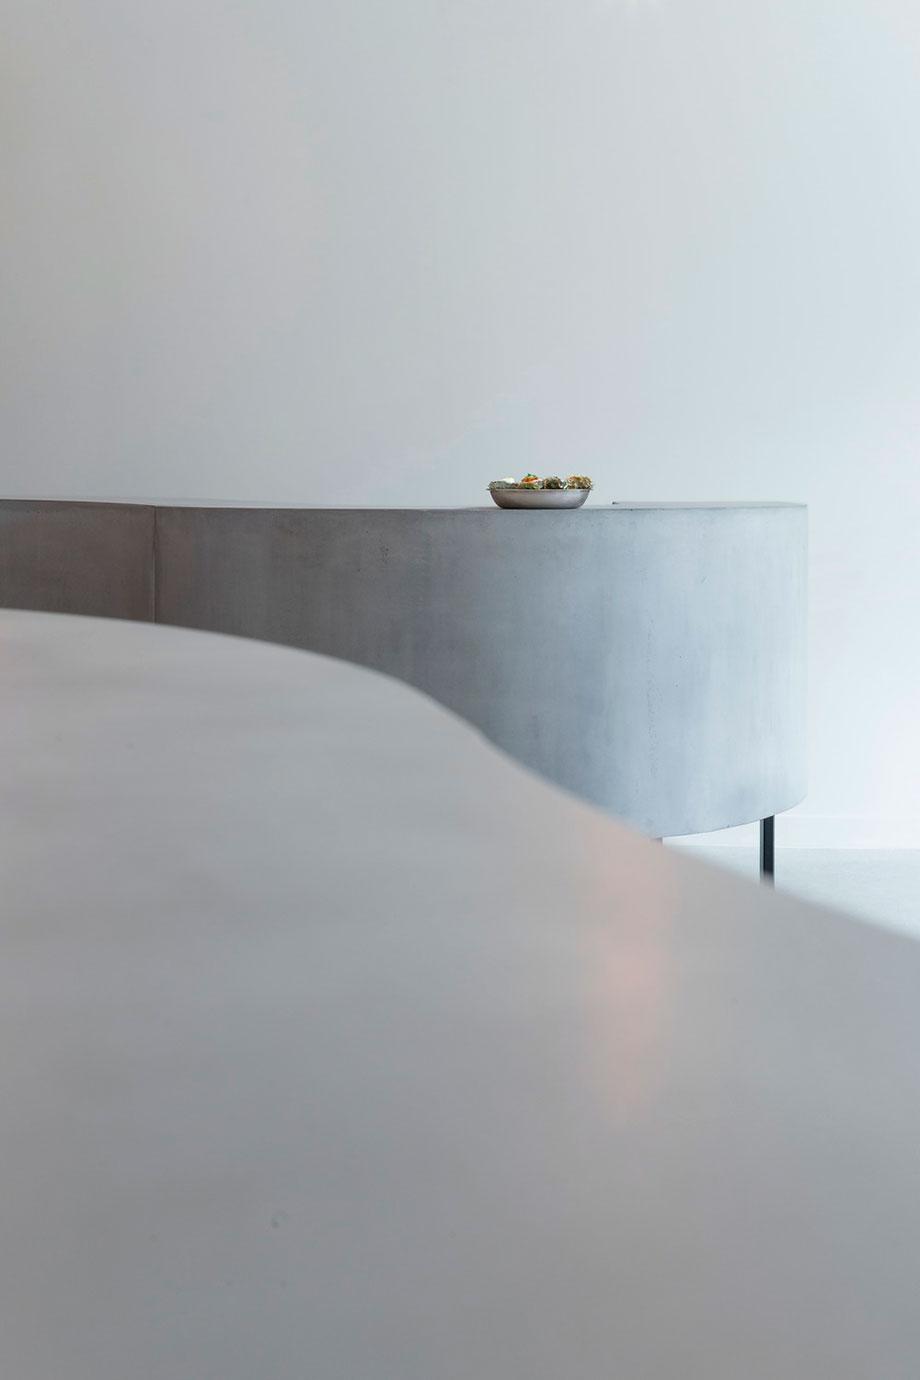 shuck shuck de batay-csorba architects (10) - foto silentsama